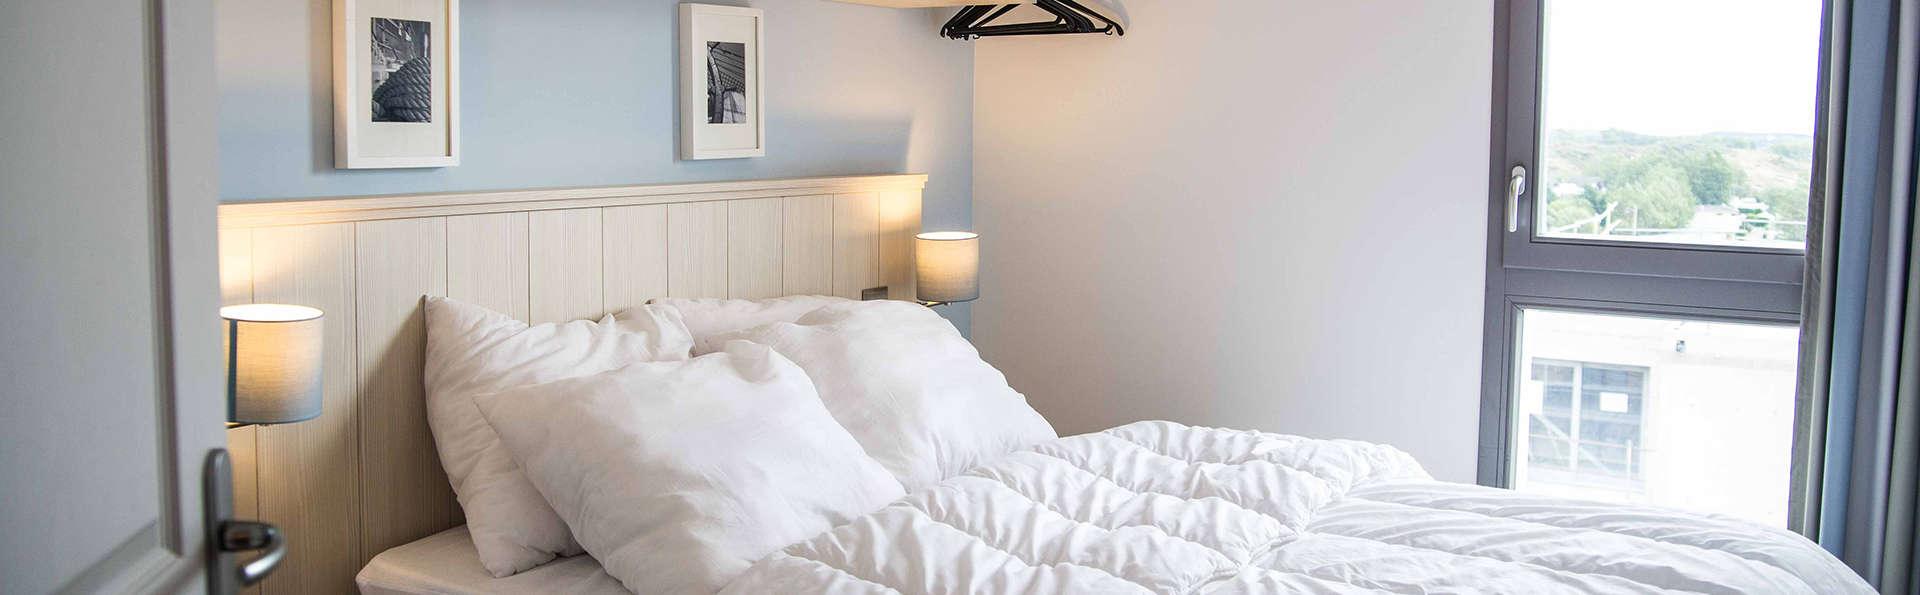 Holiday Suites Bray-Dunes Étoile de Mer - EDIT_NEW_Room.jpg